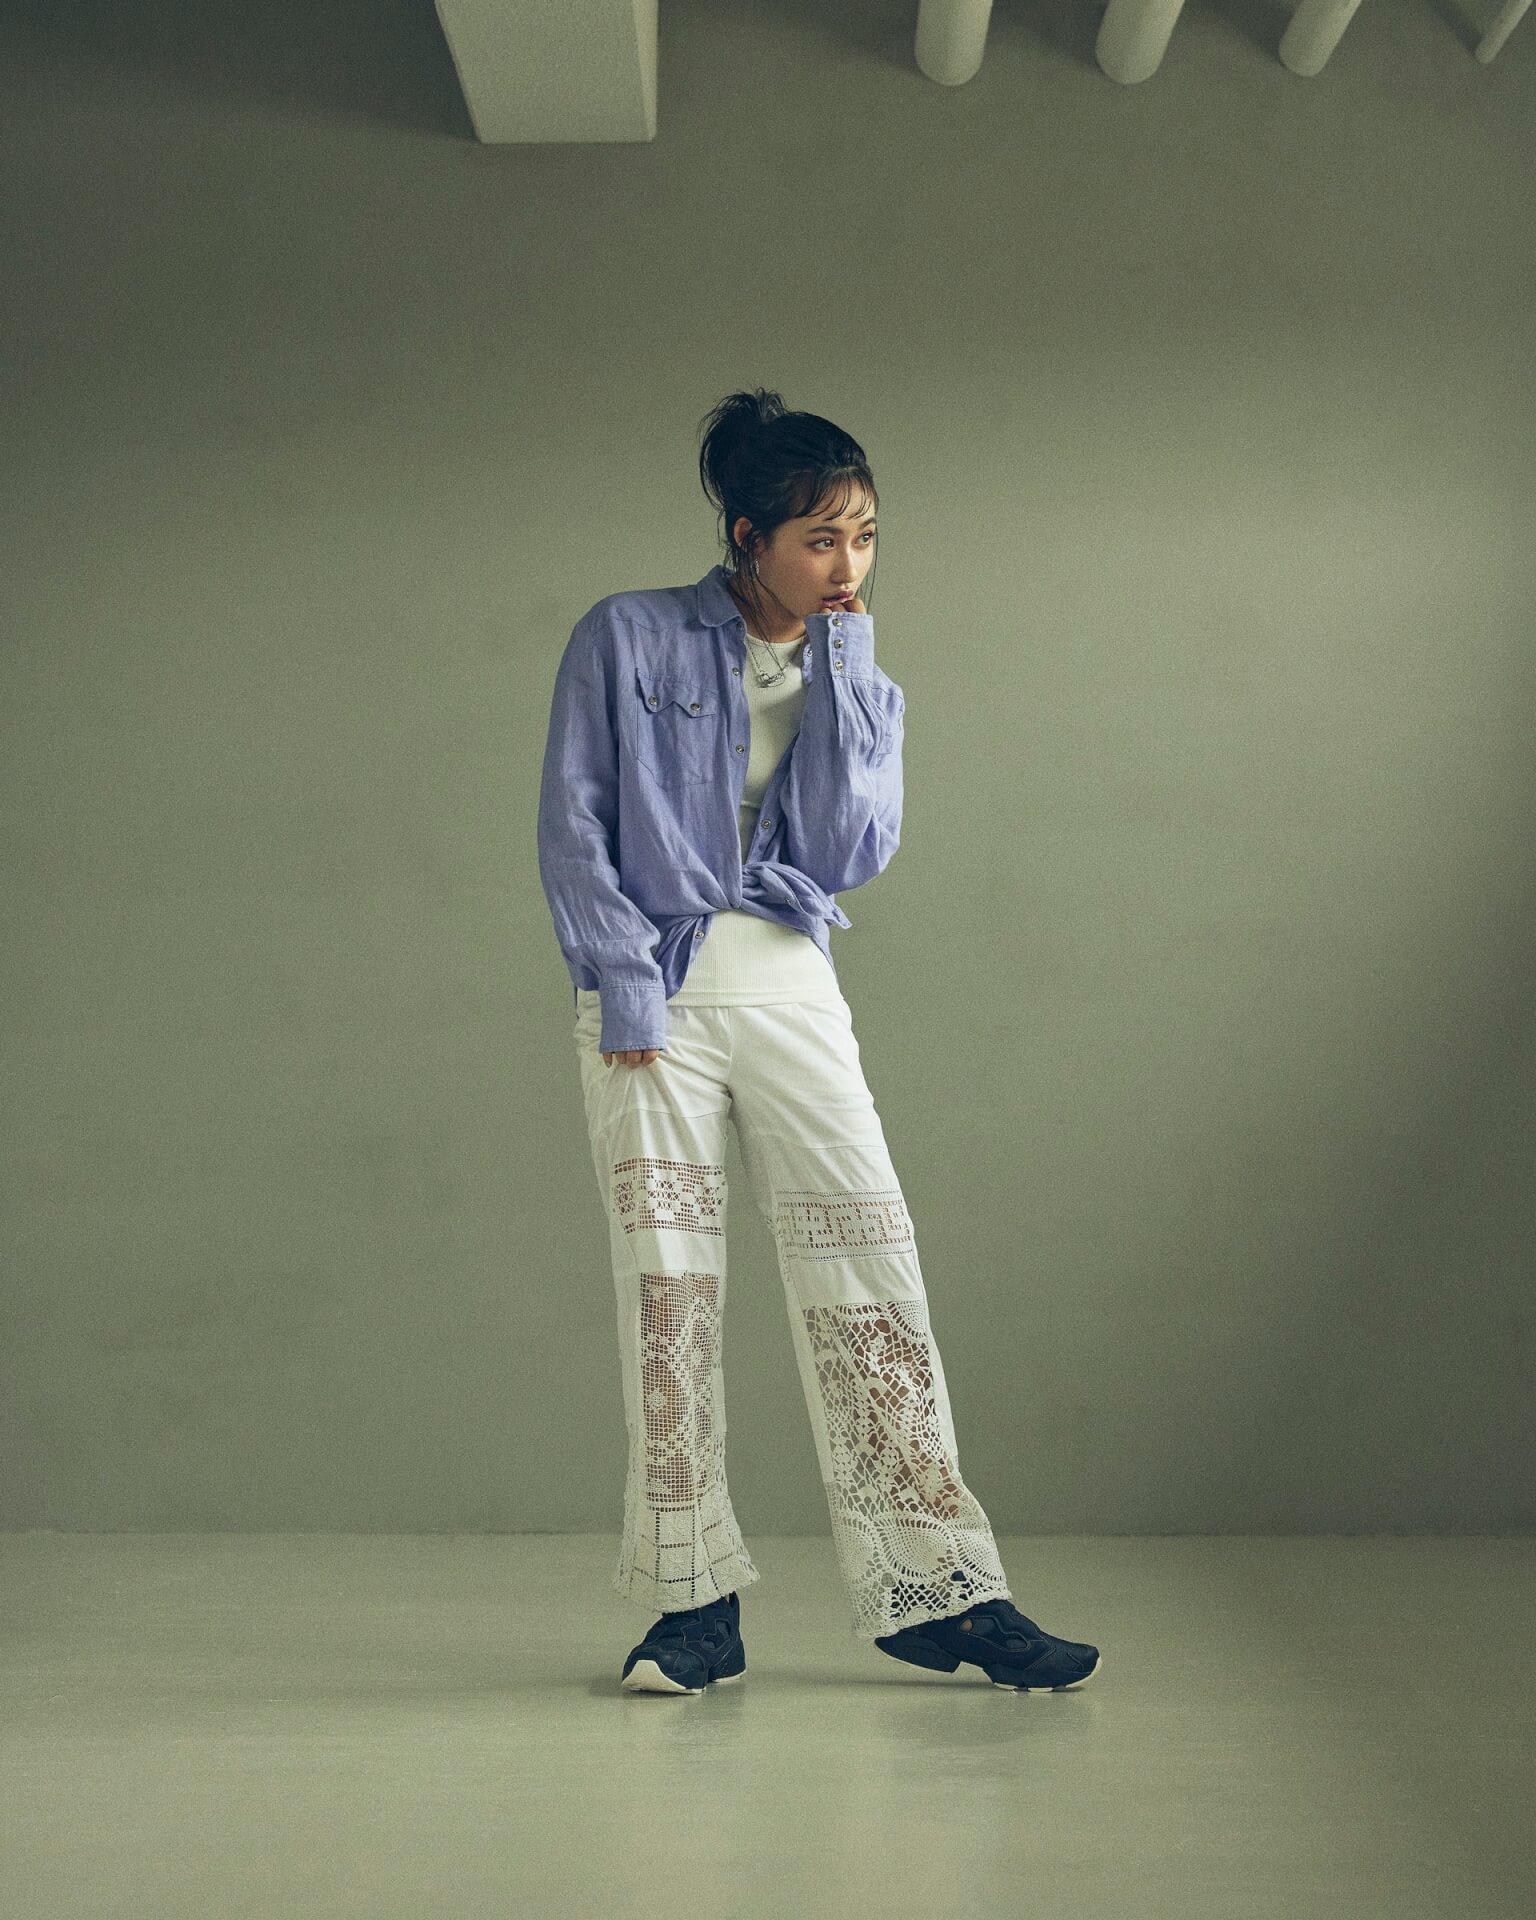 ReebokからリアルなデニムをイメージしたINSTAPUMP FURYの「DENIM PACK」が発売!櫻井海音とアンジュルム佐々木莉佳子がルックに登場 Fashion_210719_denimpack6